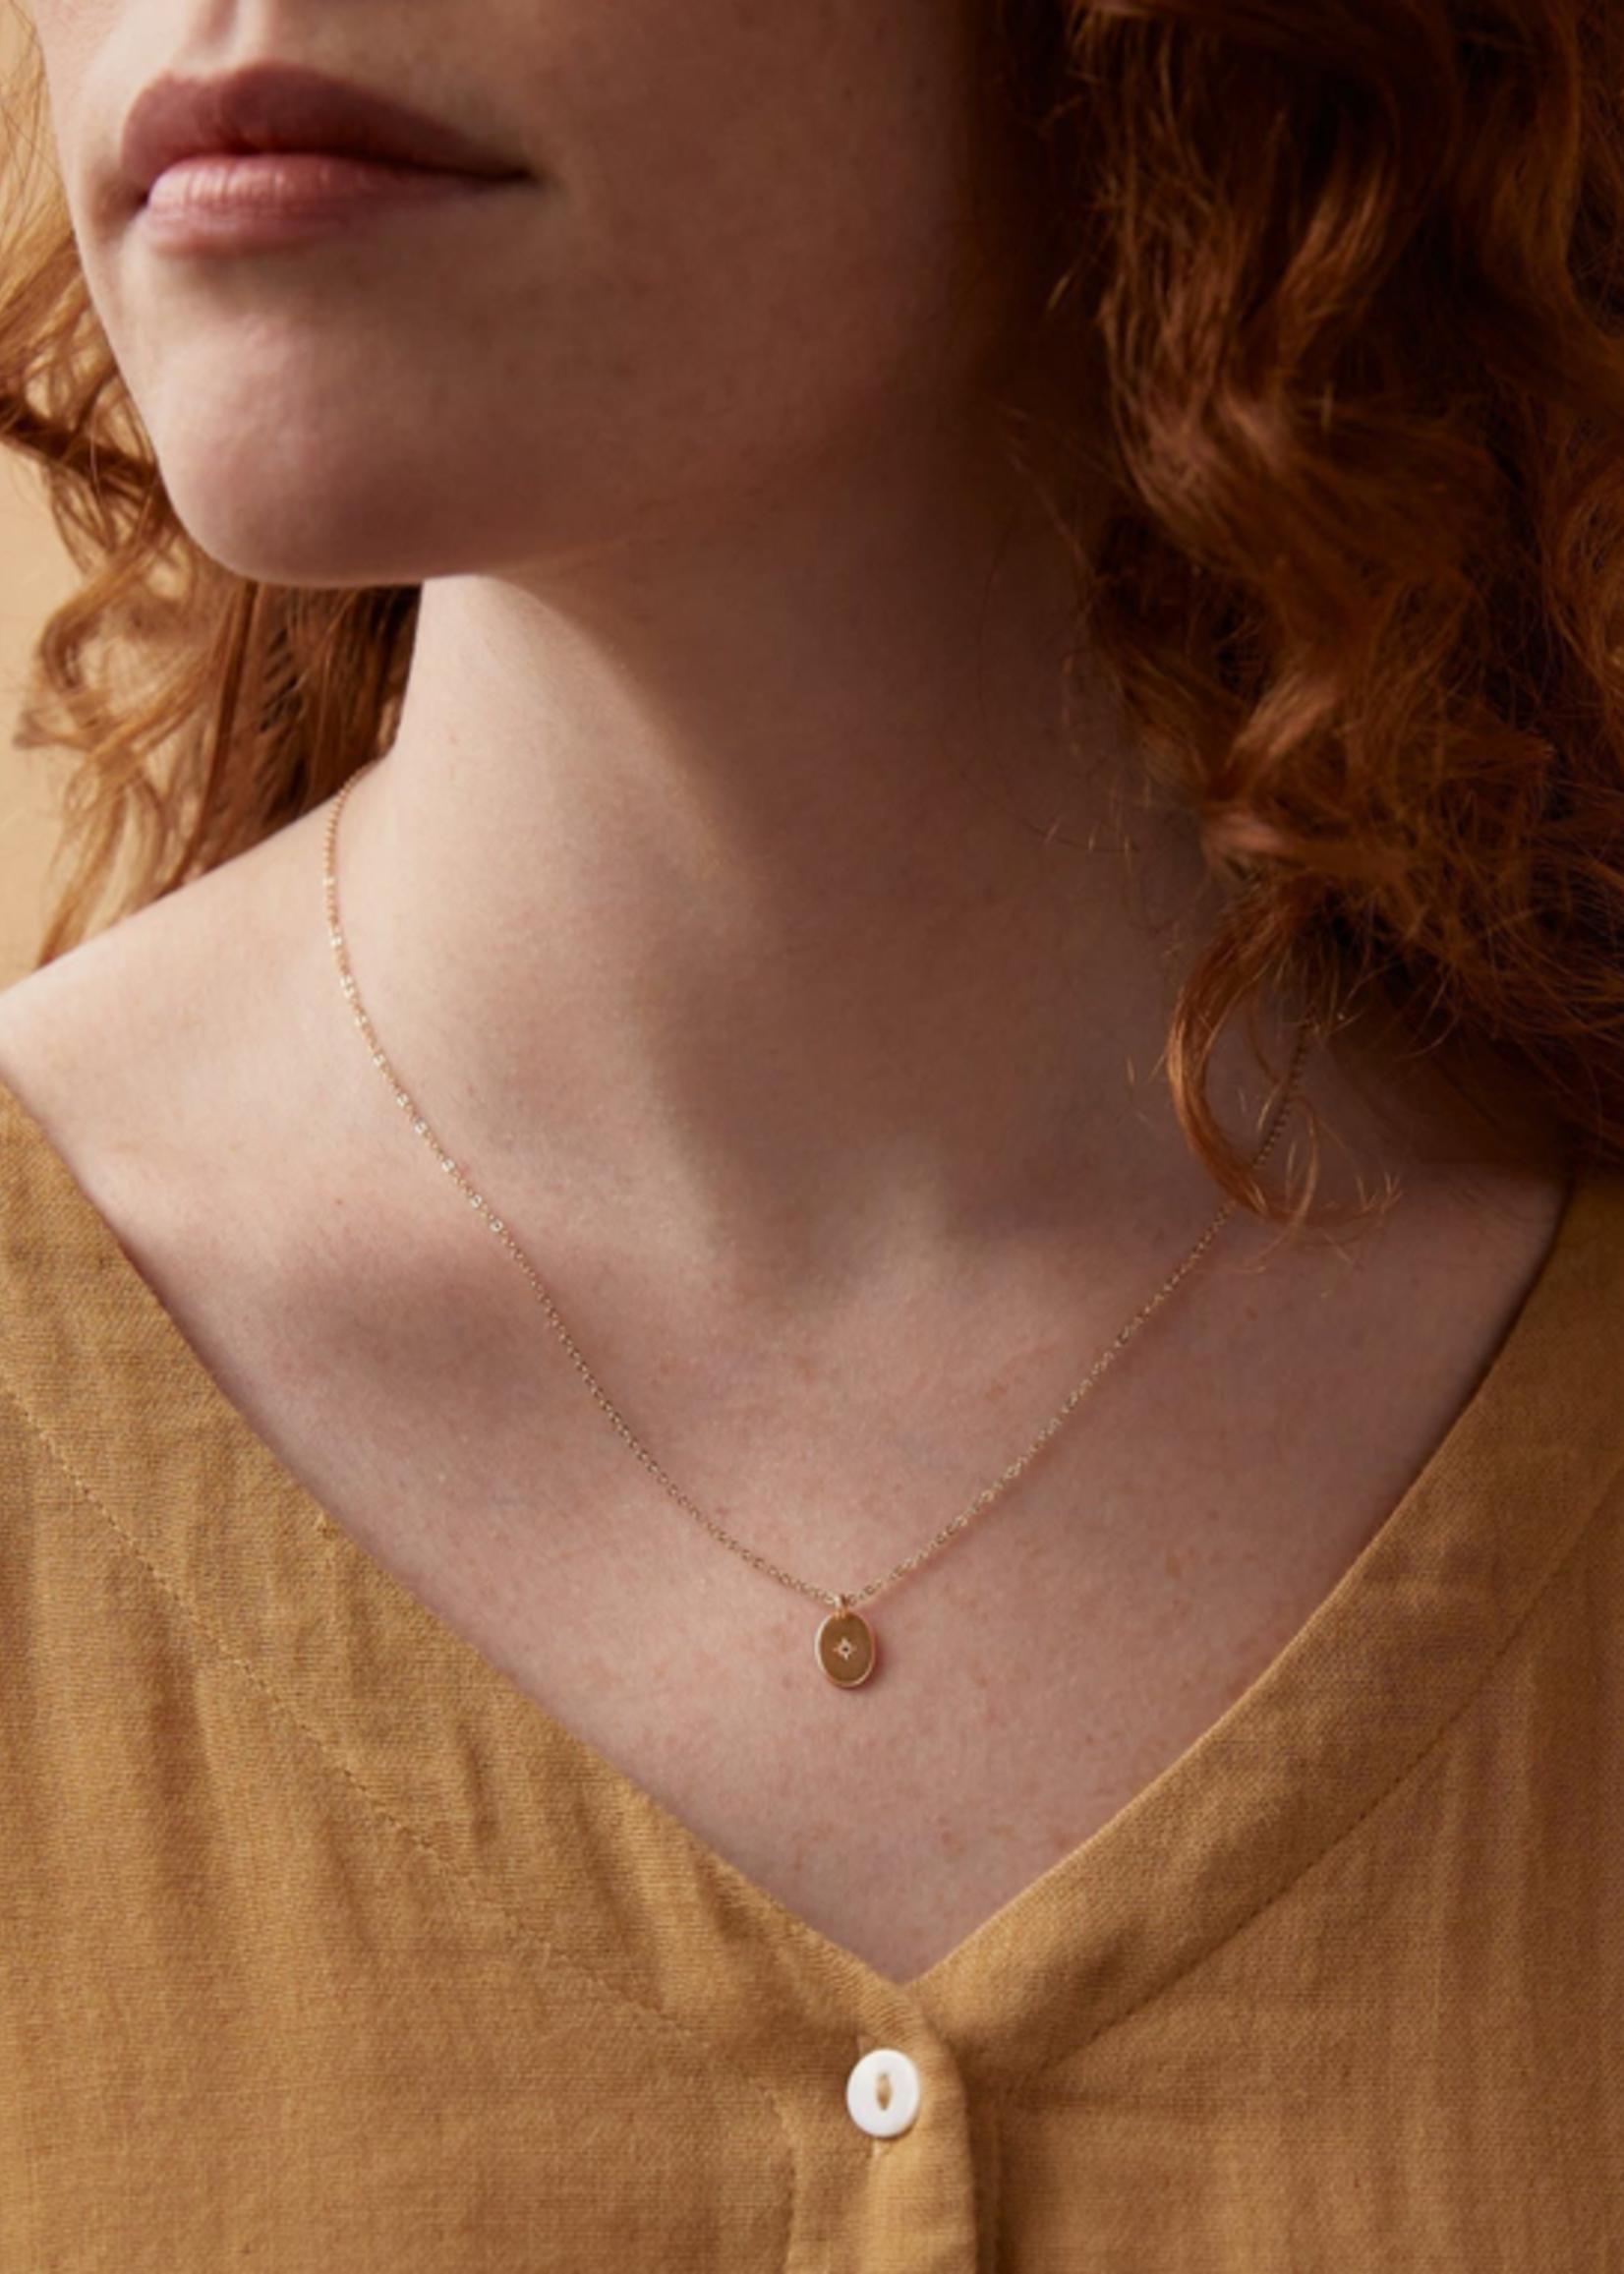 Elitaire Boutique Dainty Oval Necklace